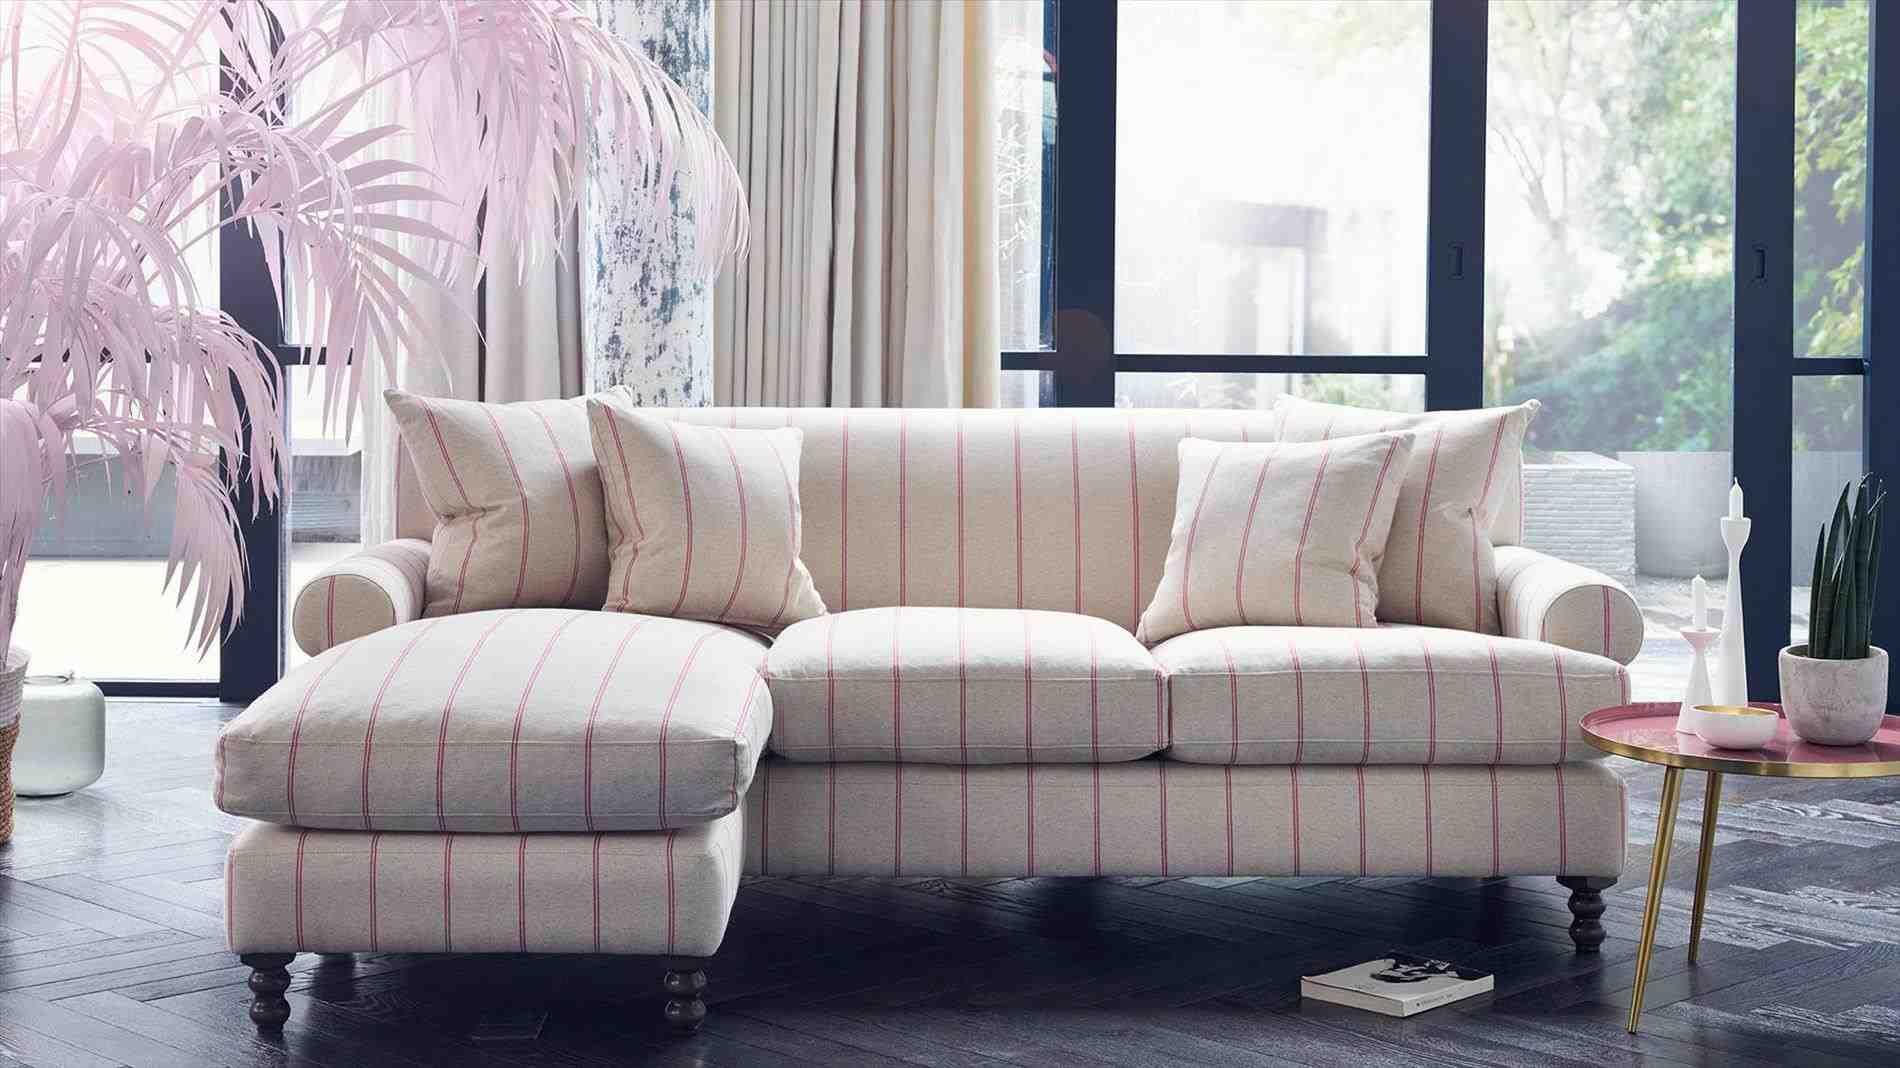 pratts corner sofas polaris italian leather sectional sofa in grey cheap leeds microfinanceindia org